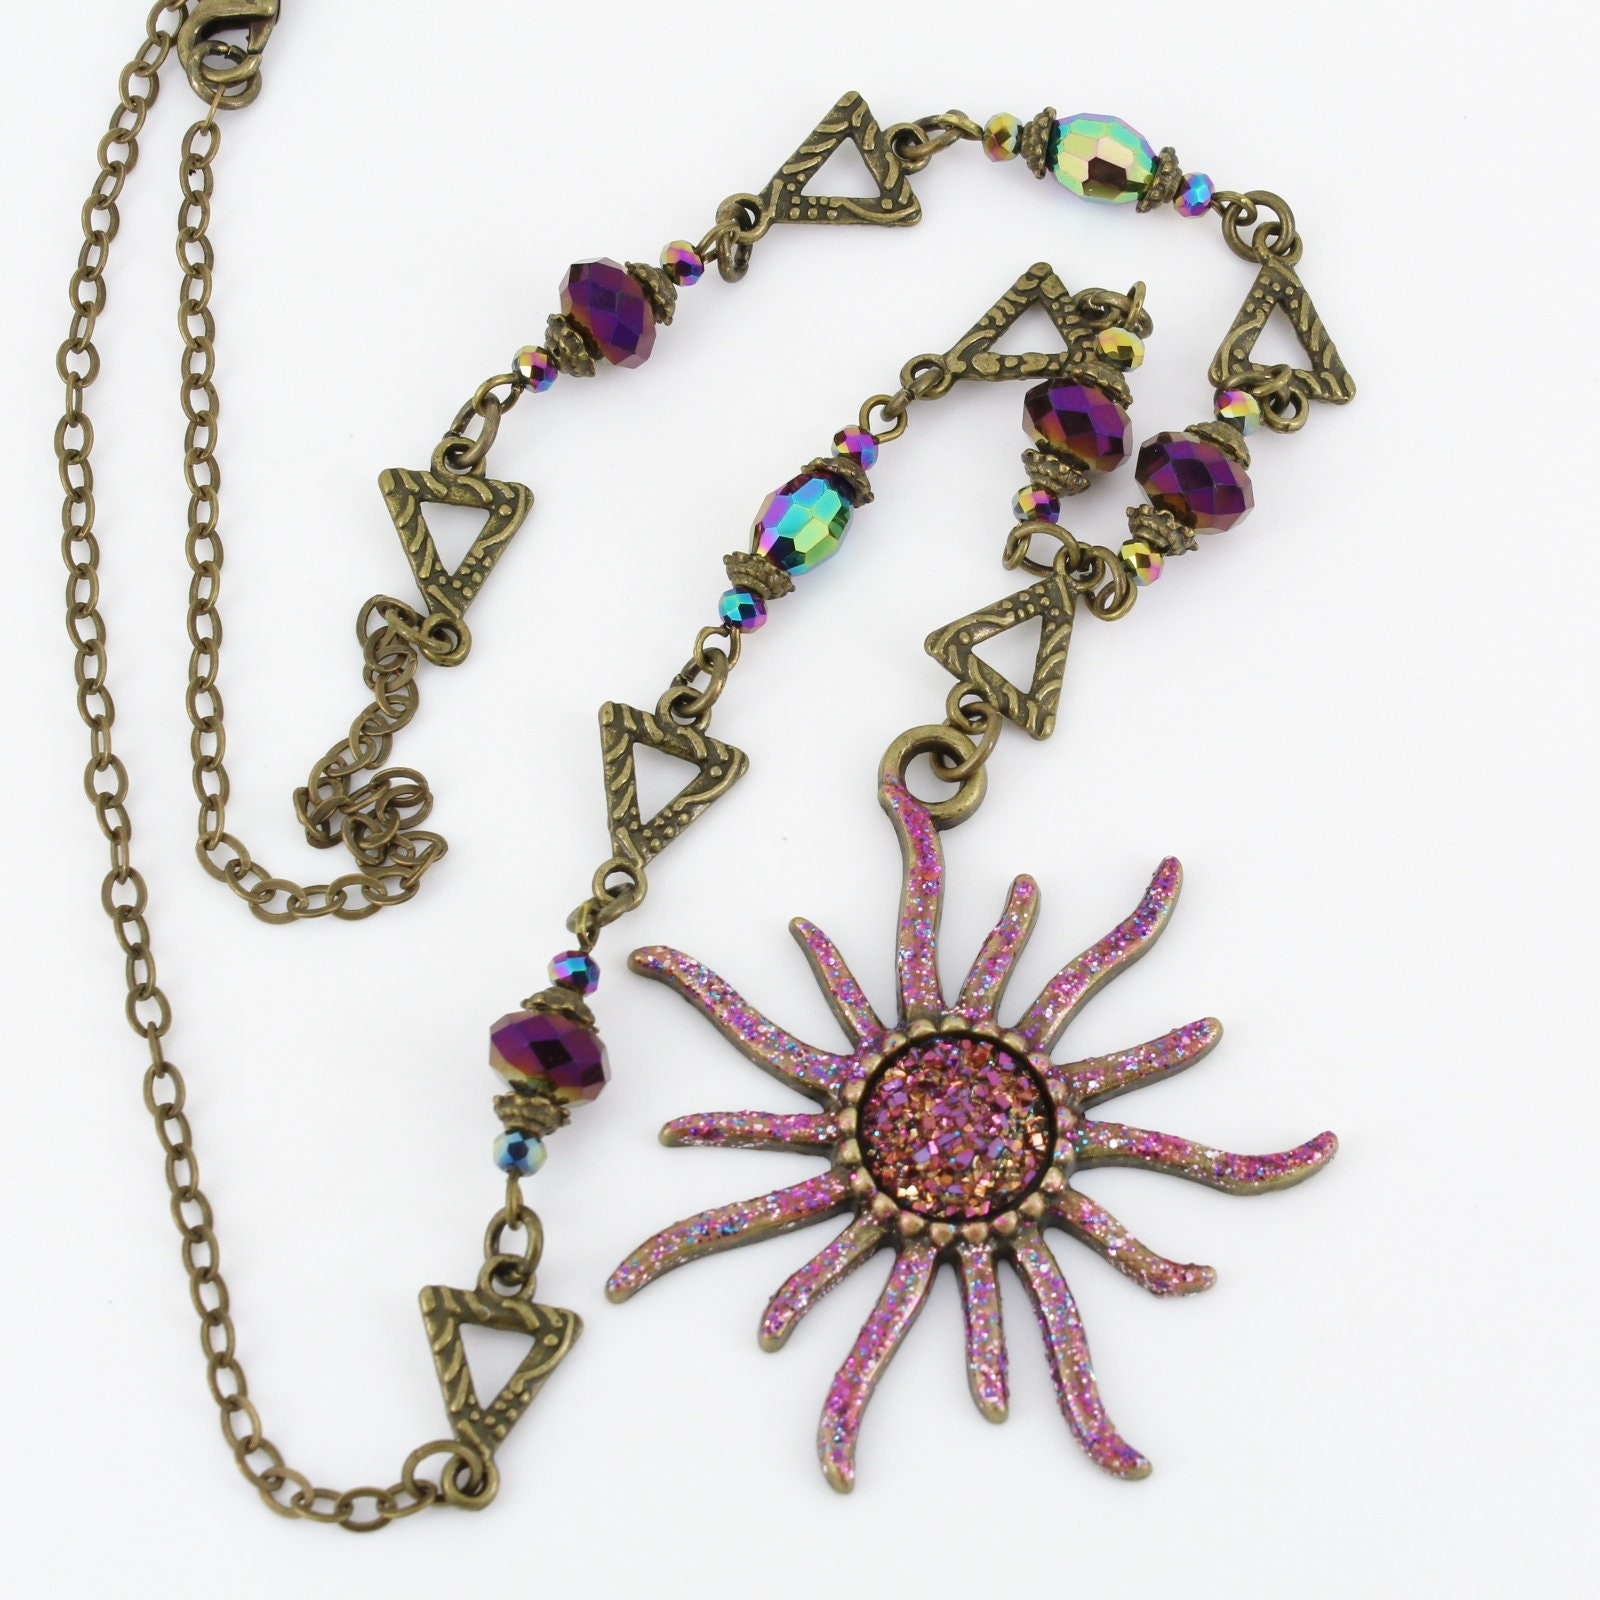 Sunburst,Necklace,Jewelry,sunburst,sparkly,geometric,space,sun,one_of_a_kind,purple,rainbow,iridescent,antique_brass,bronze,Brass,crystals,glitter polish and sealer,safe metal alloys